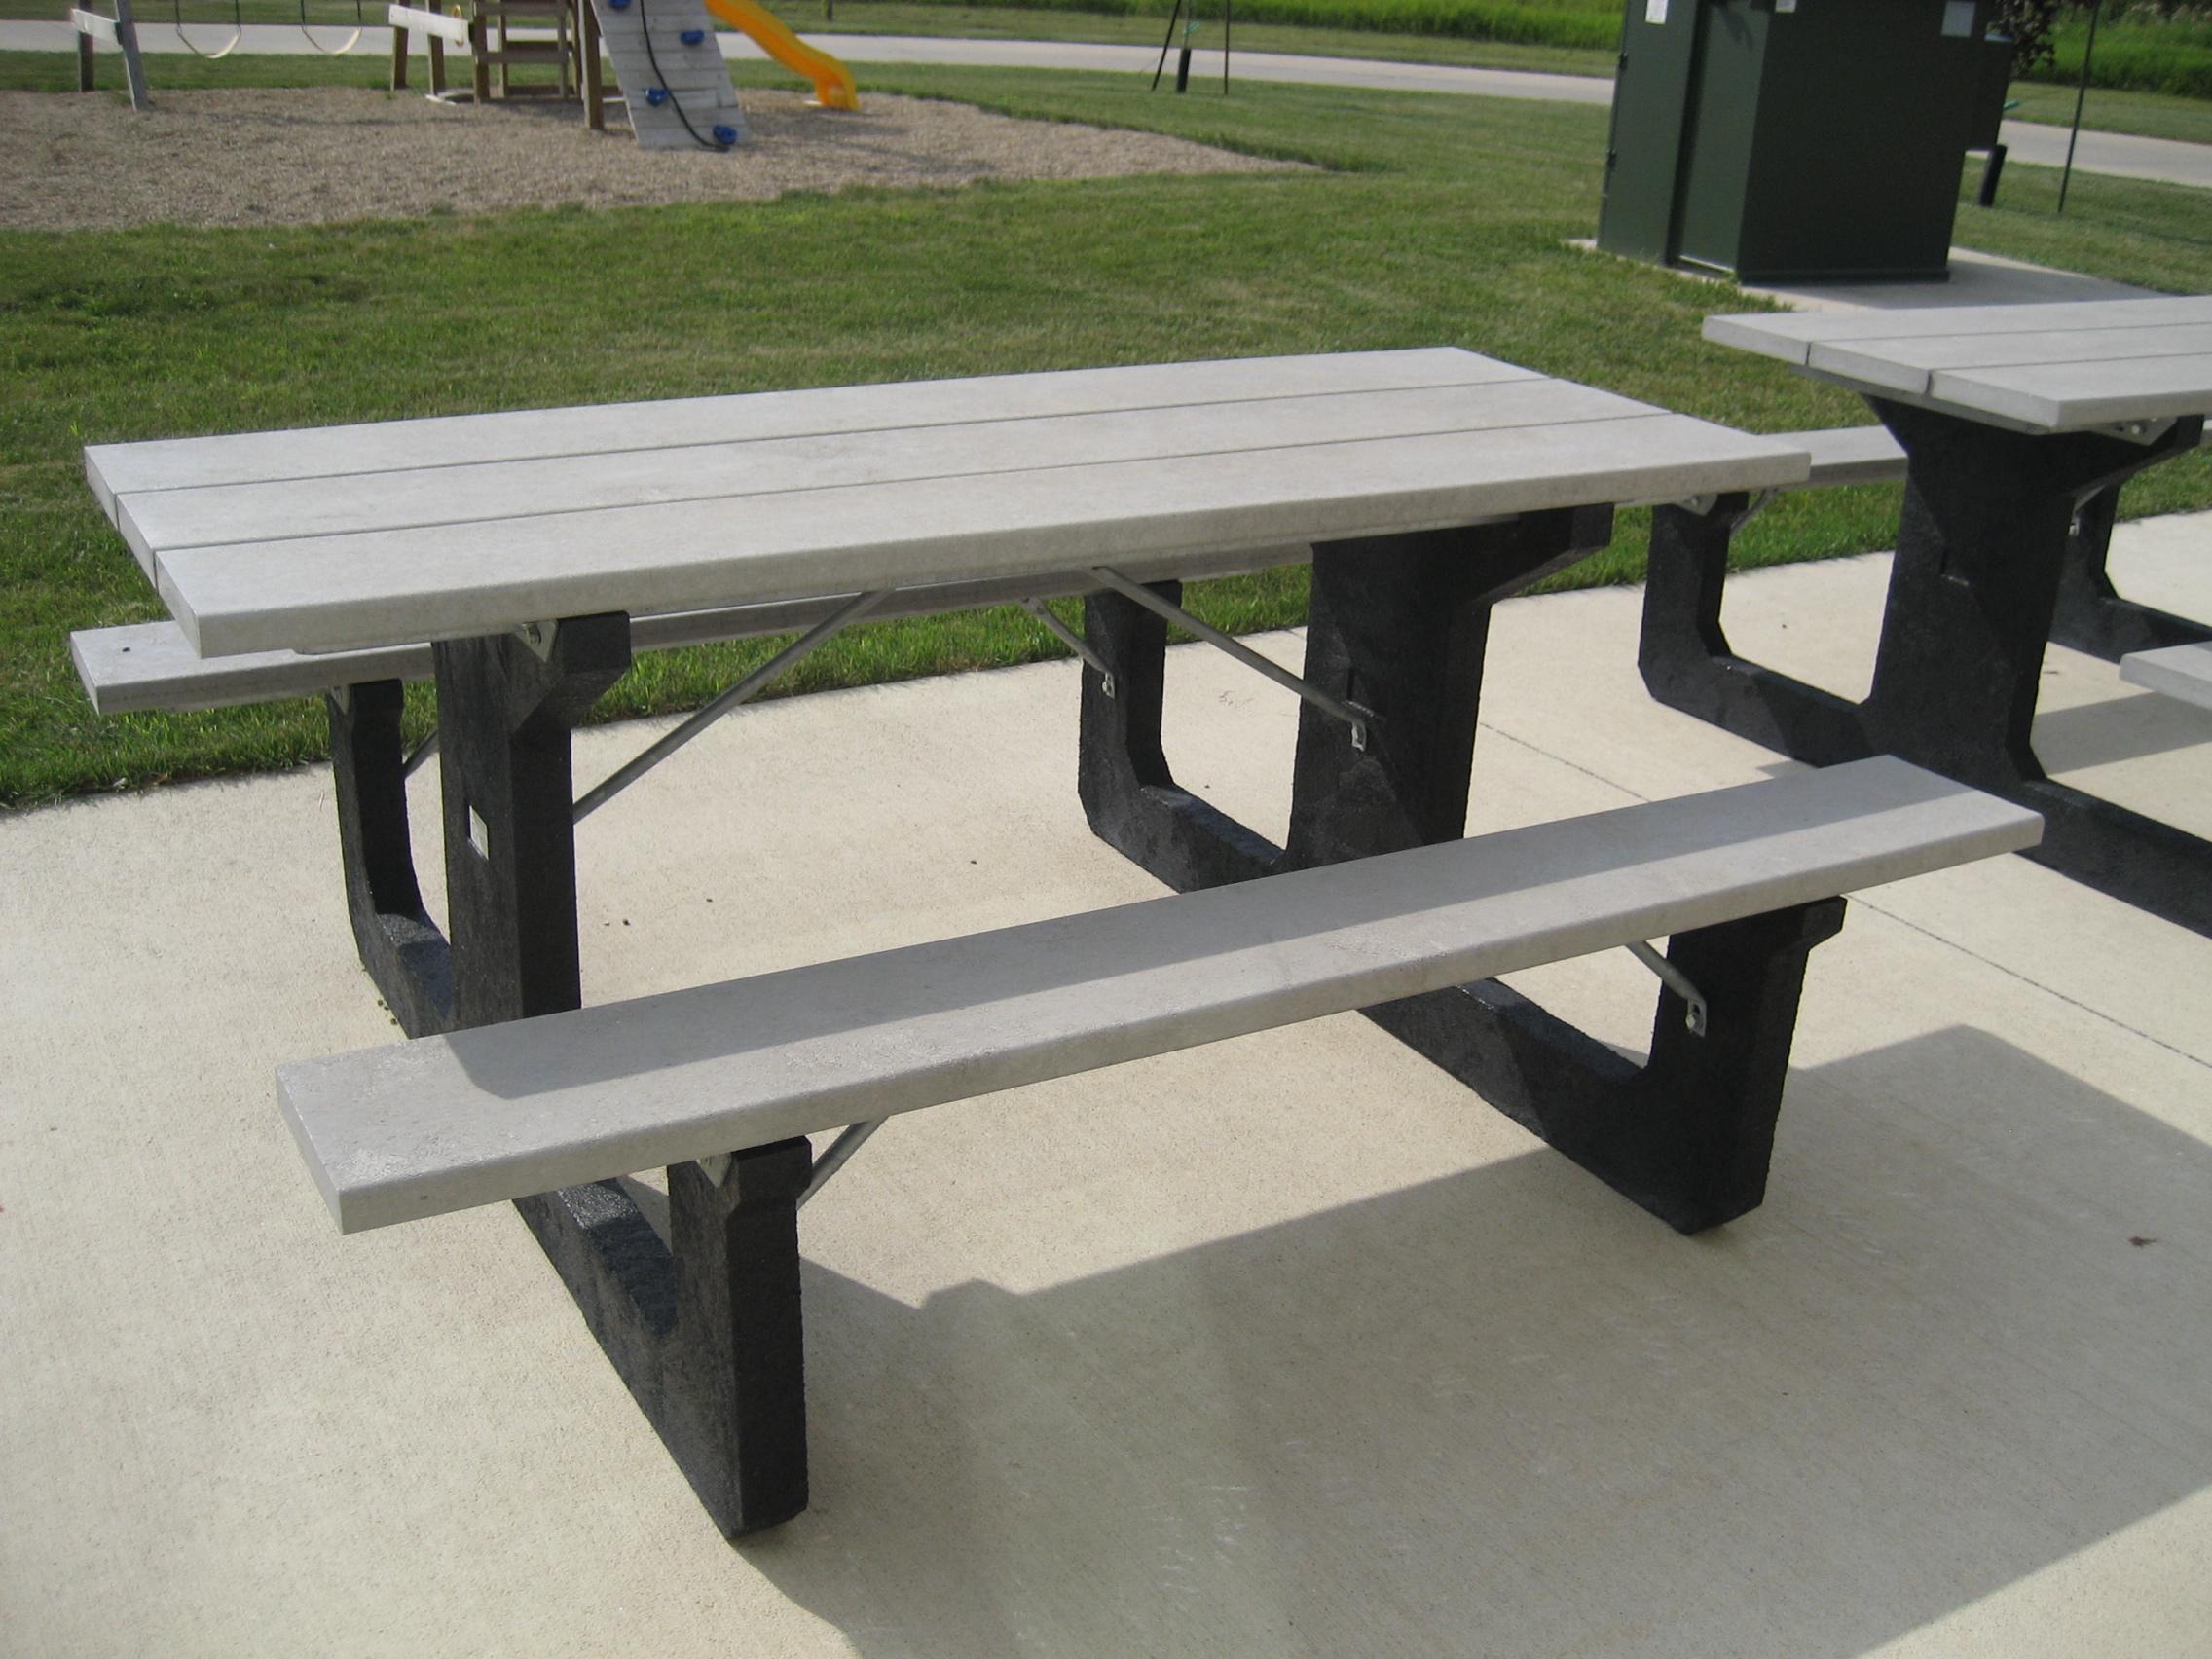 Walk Through Picnic Table - Walk in picnic table